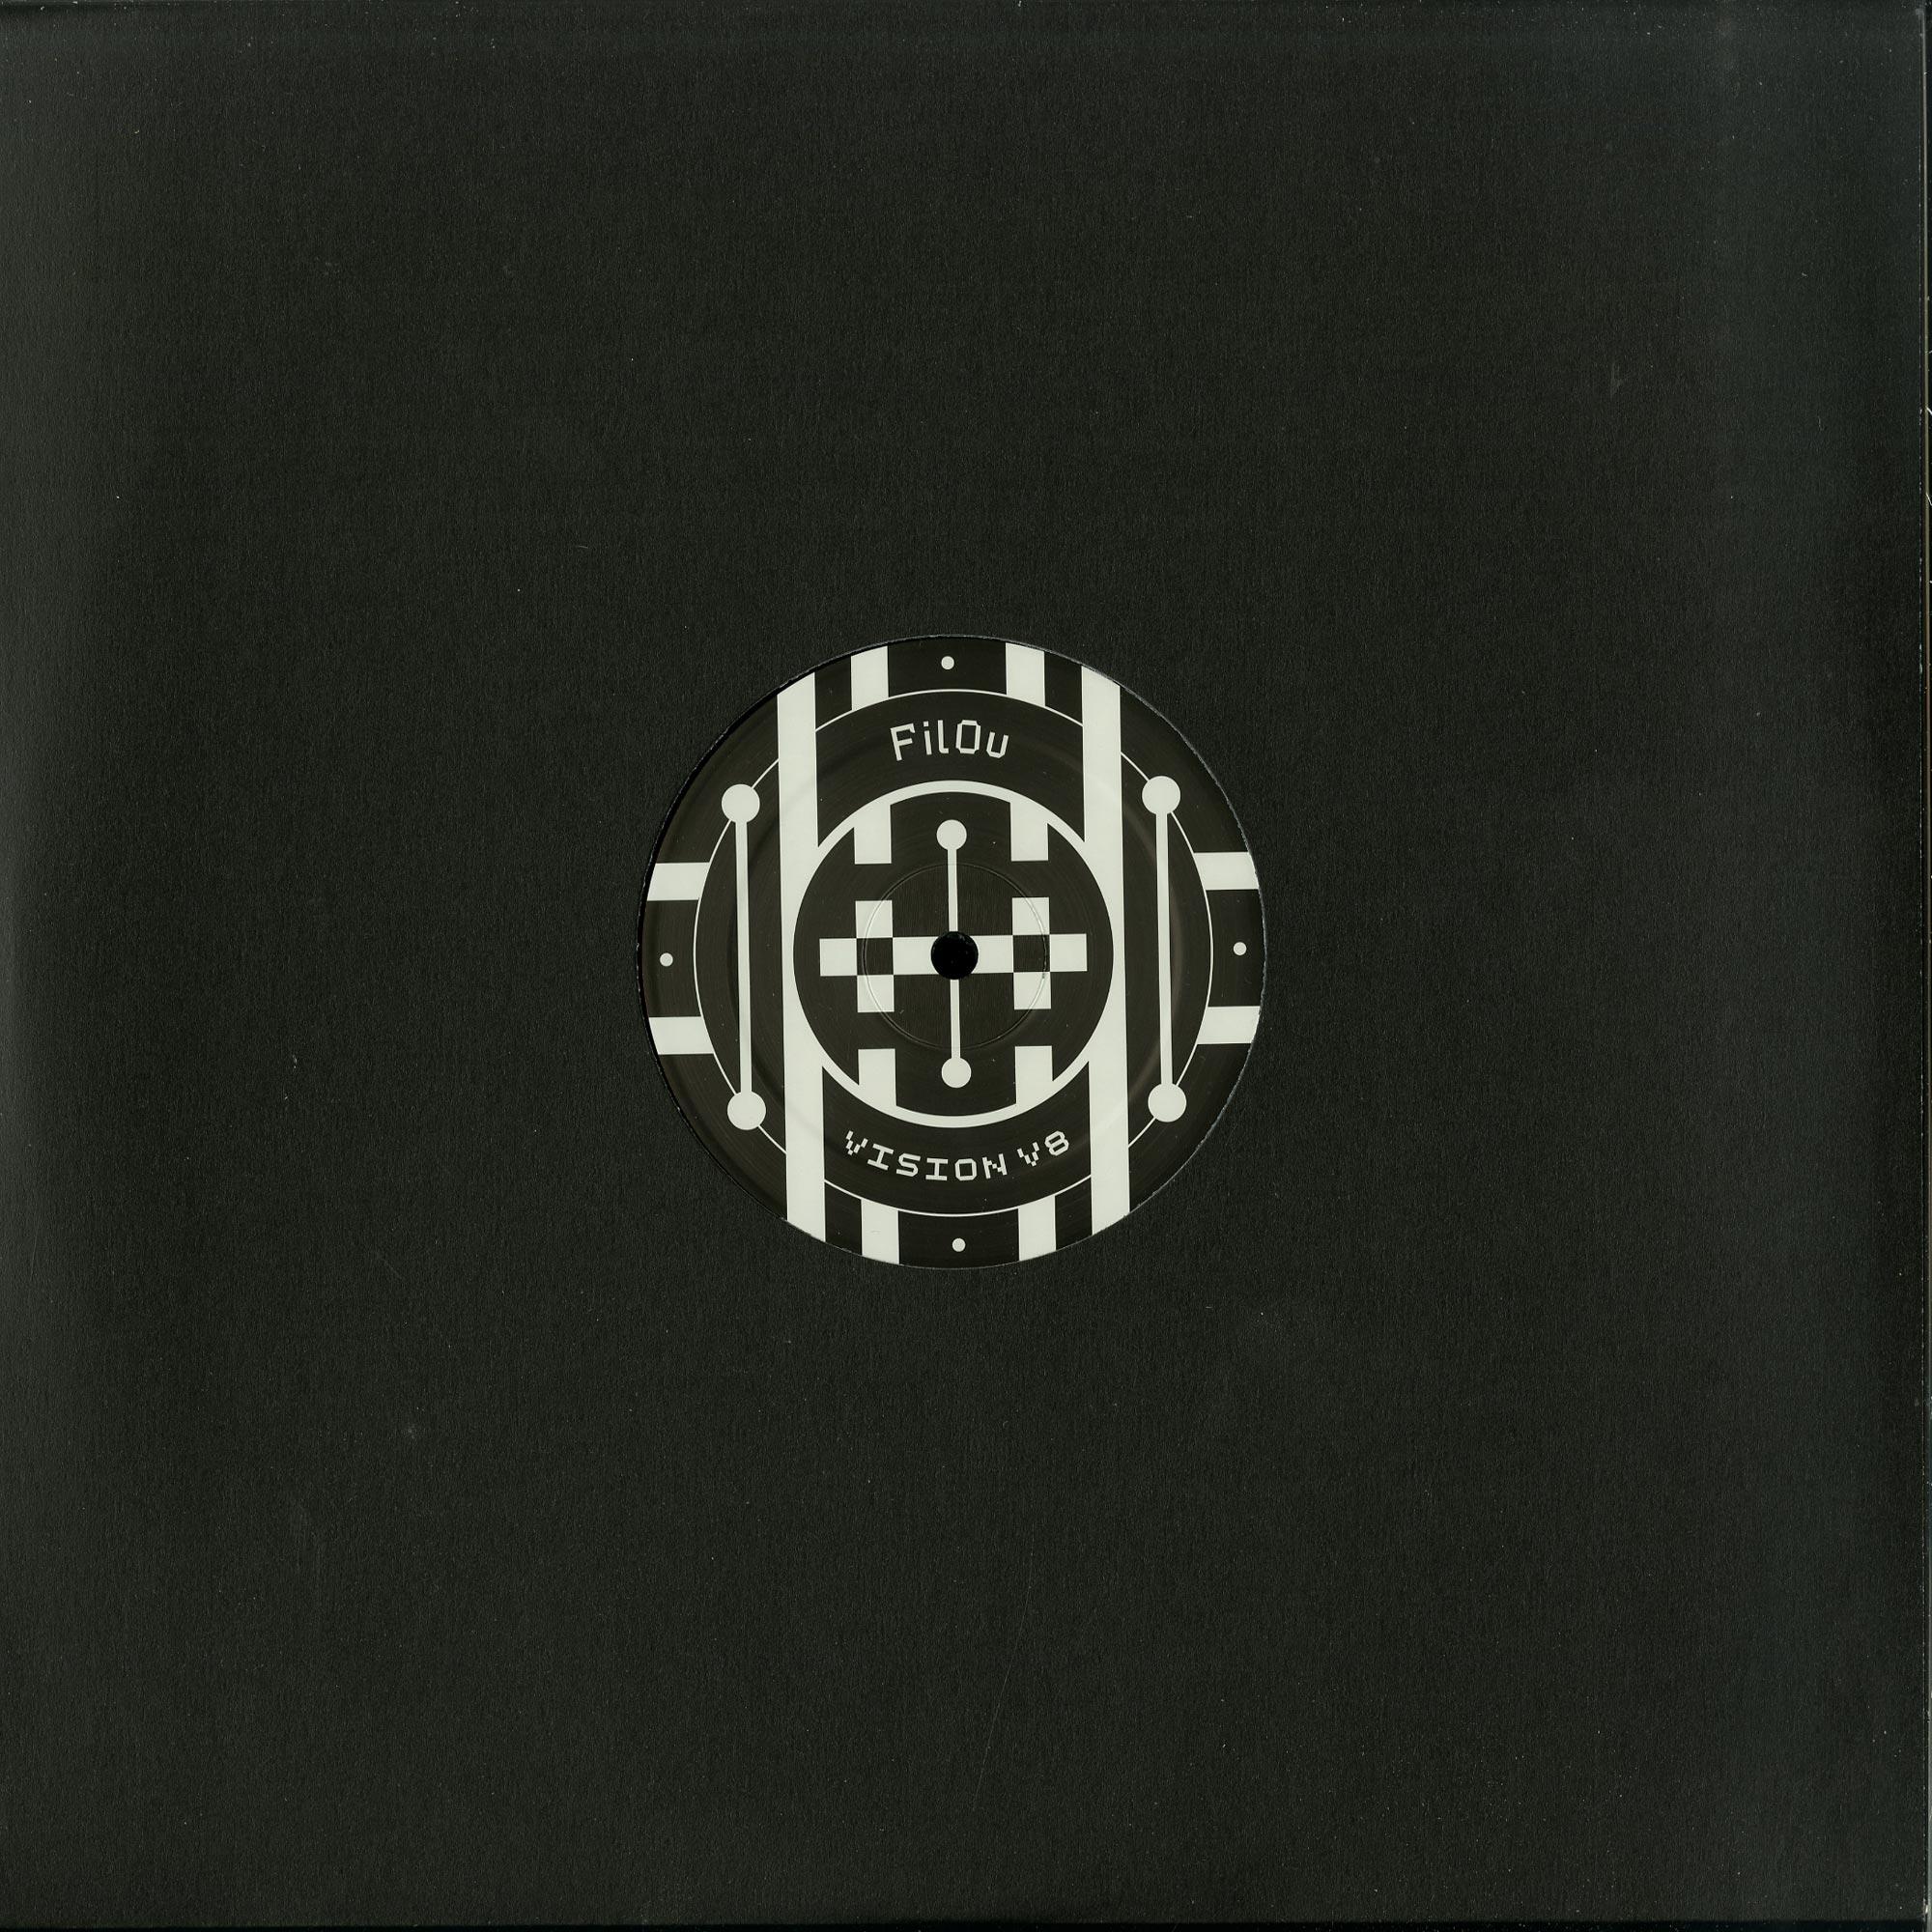 FilOu - VISION V8